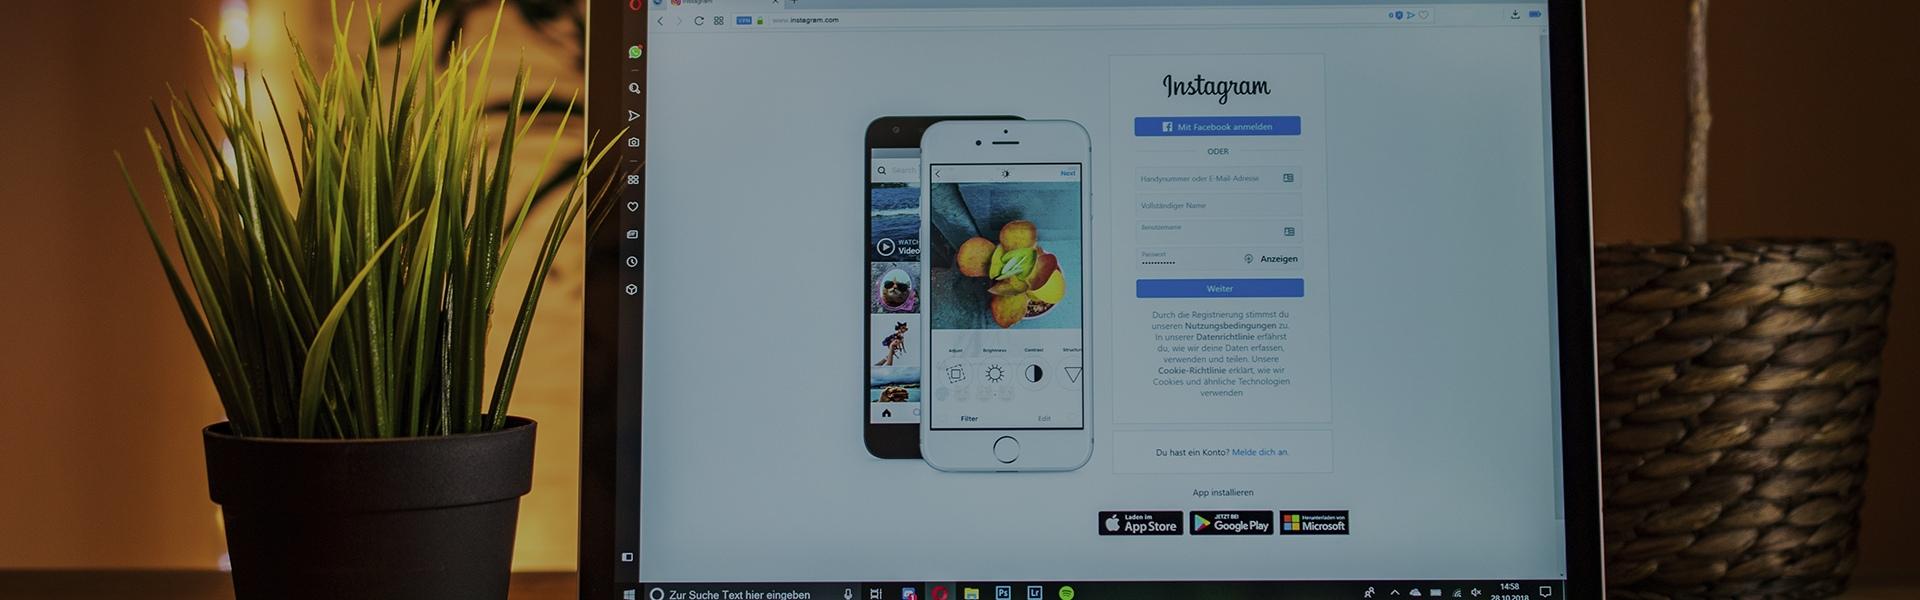 Сервис Instagram журнал был запущен!